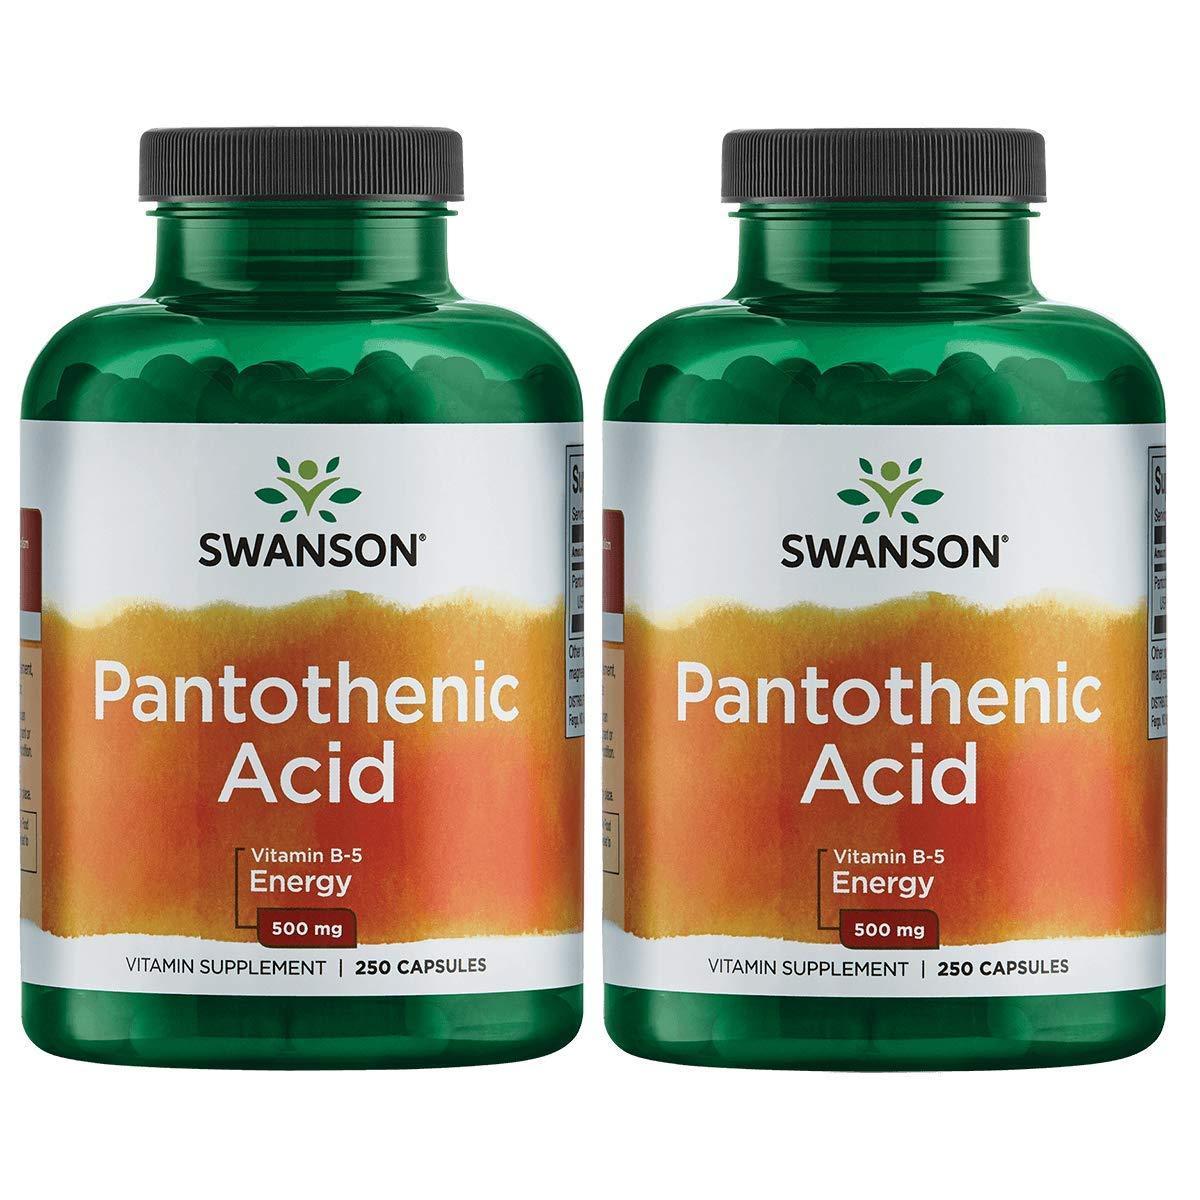 Swanson Pantothenic Acid (Vitamin B-5) Energy Metabolism Nerve Function Support 500 mg 250 Capsules (Caps) (2 Pack)